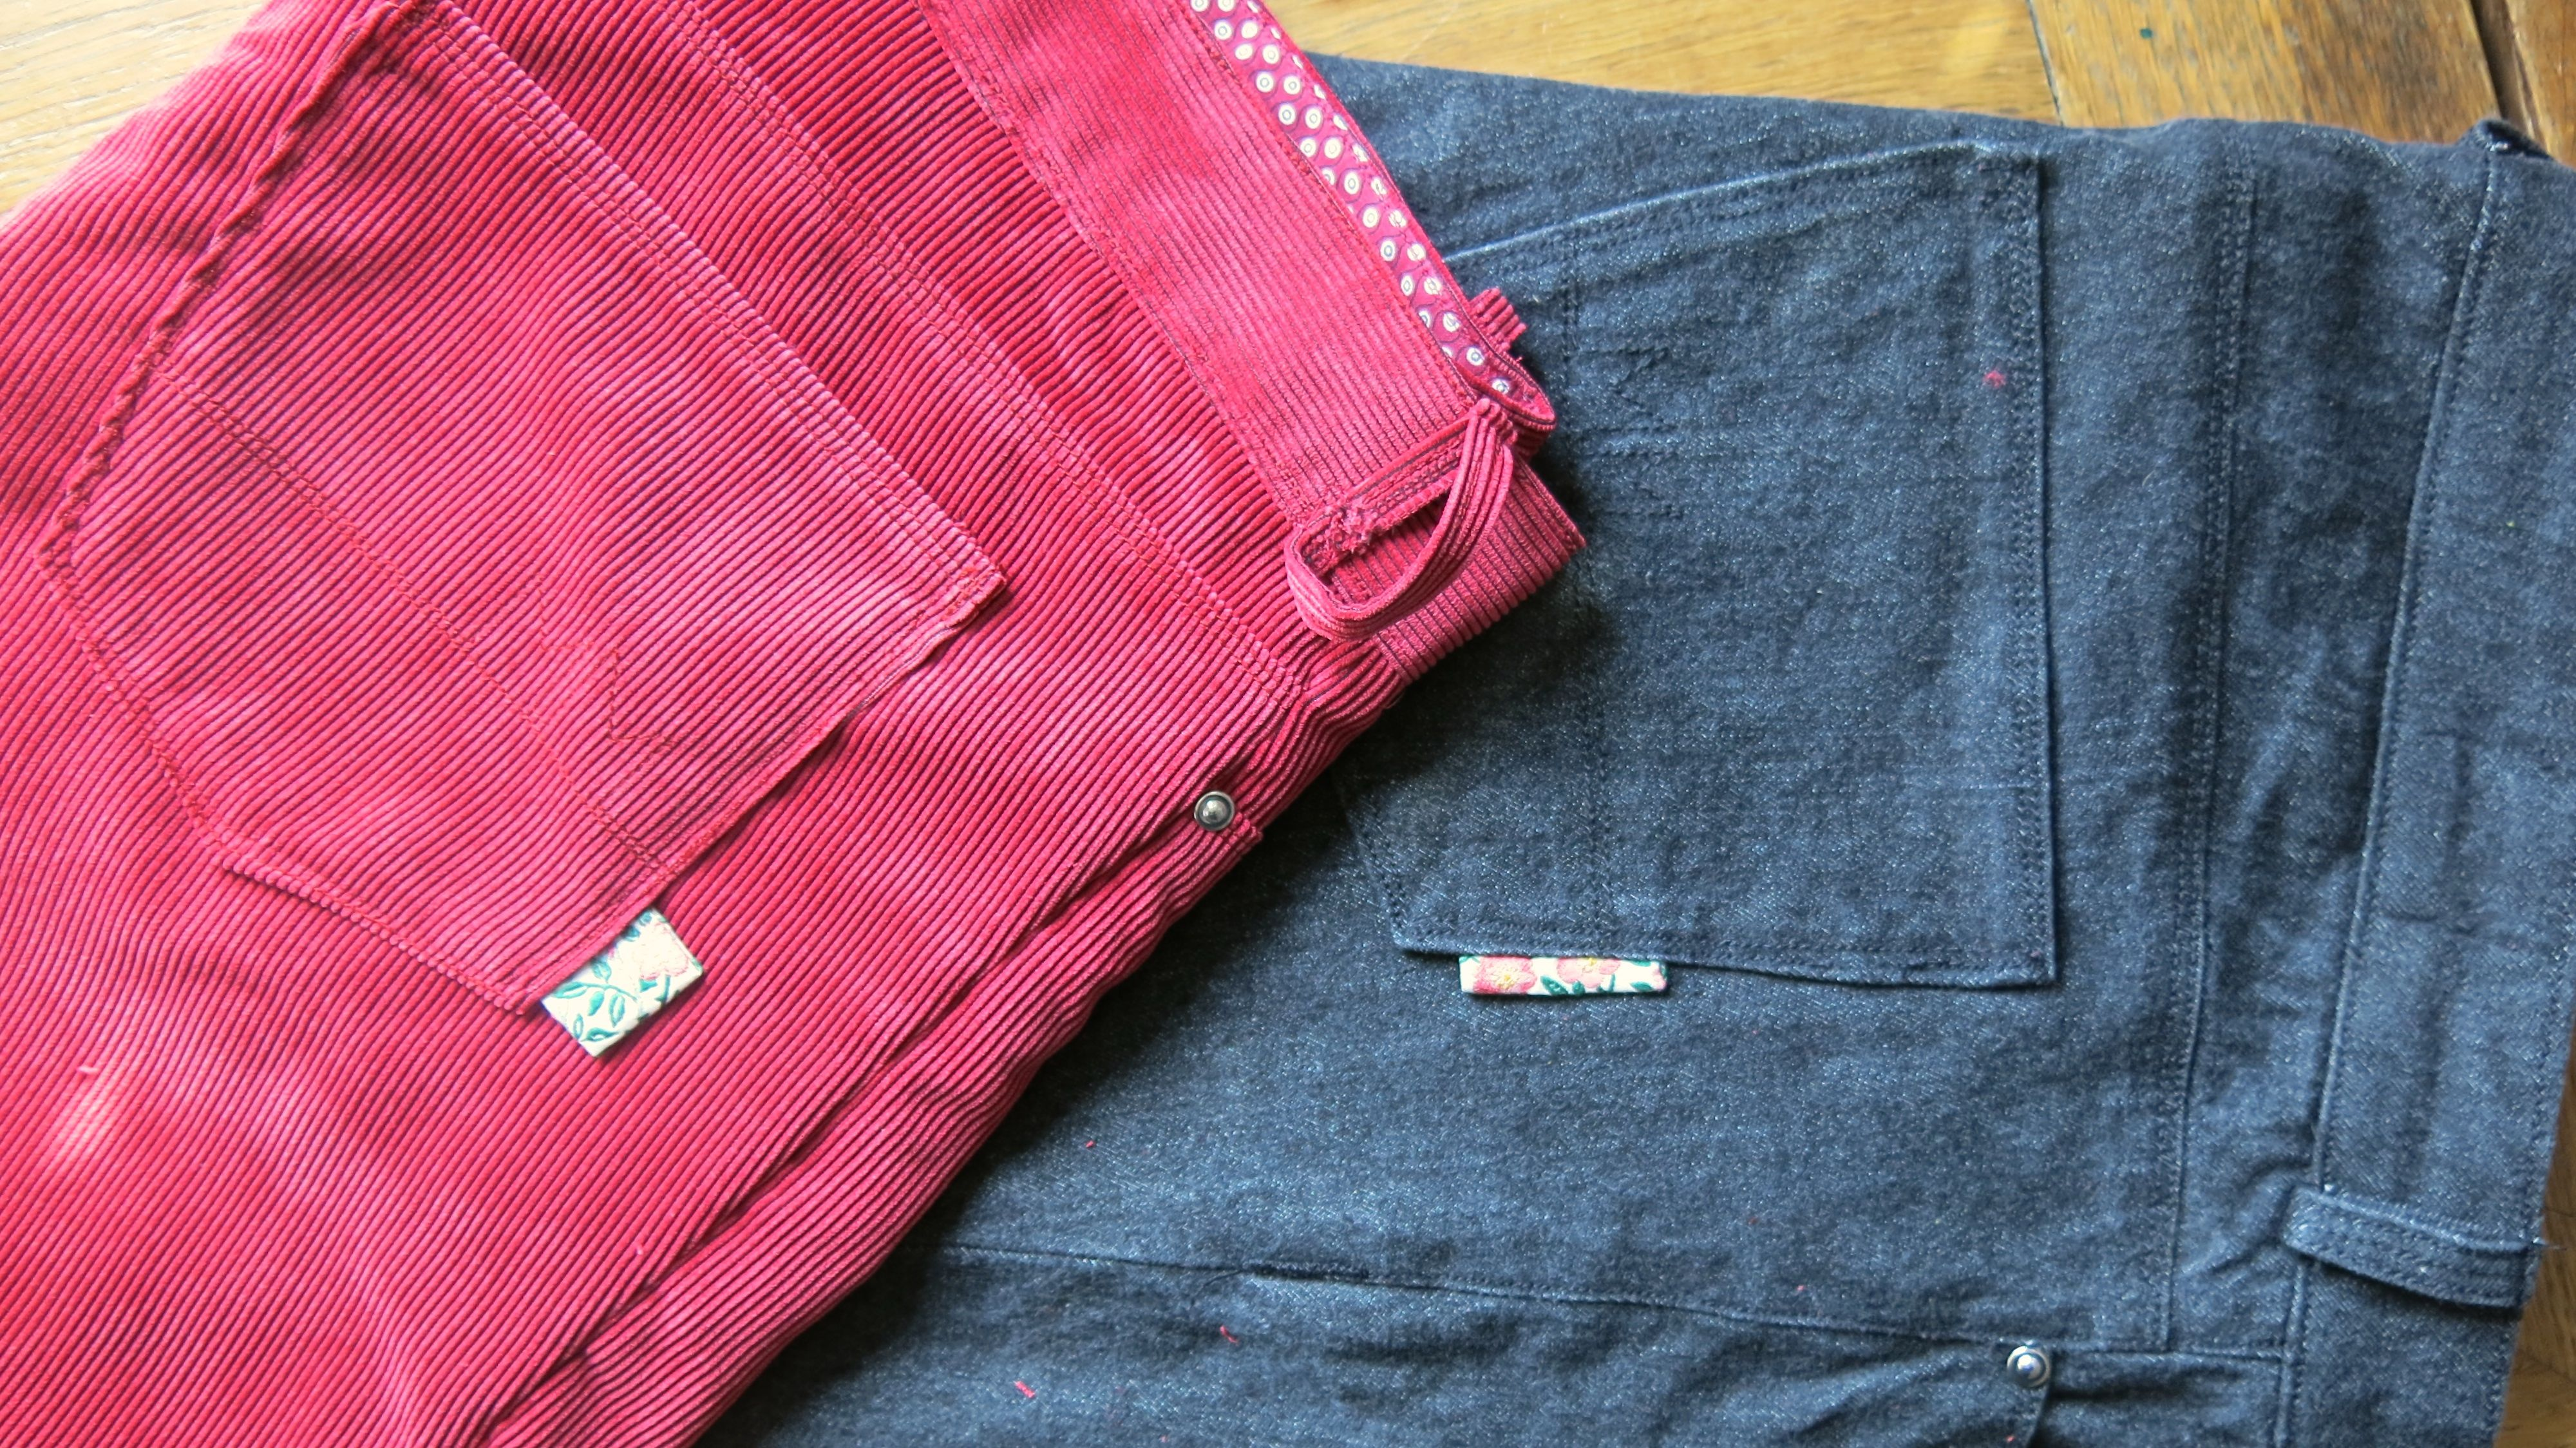 Schnittmusterbeschreibung – Jeans Ginger von Closet Case | mema